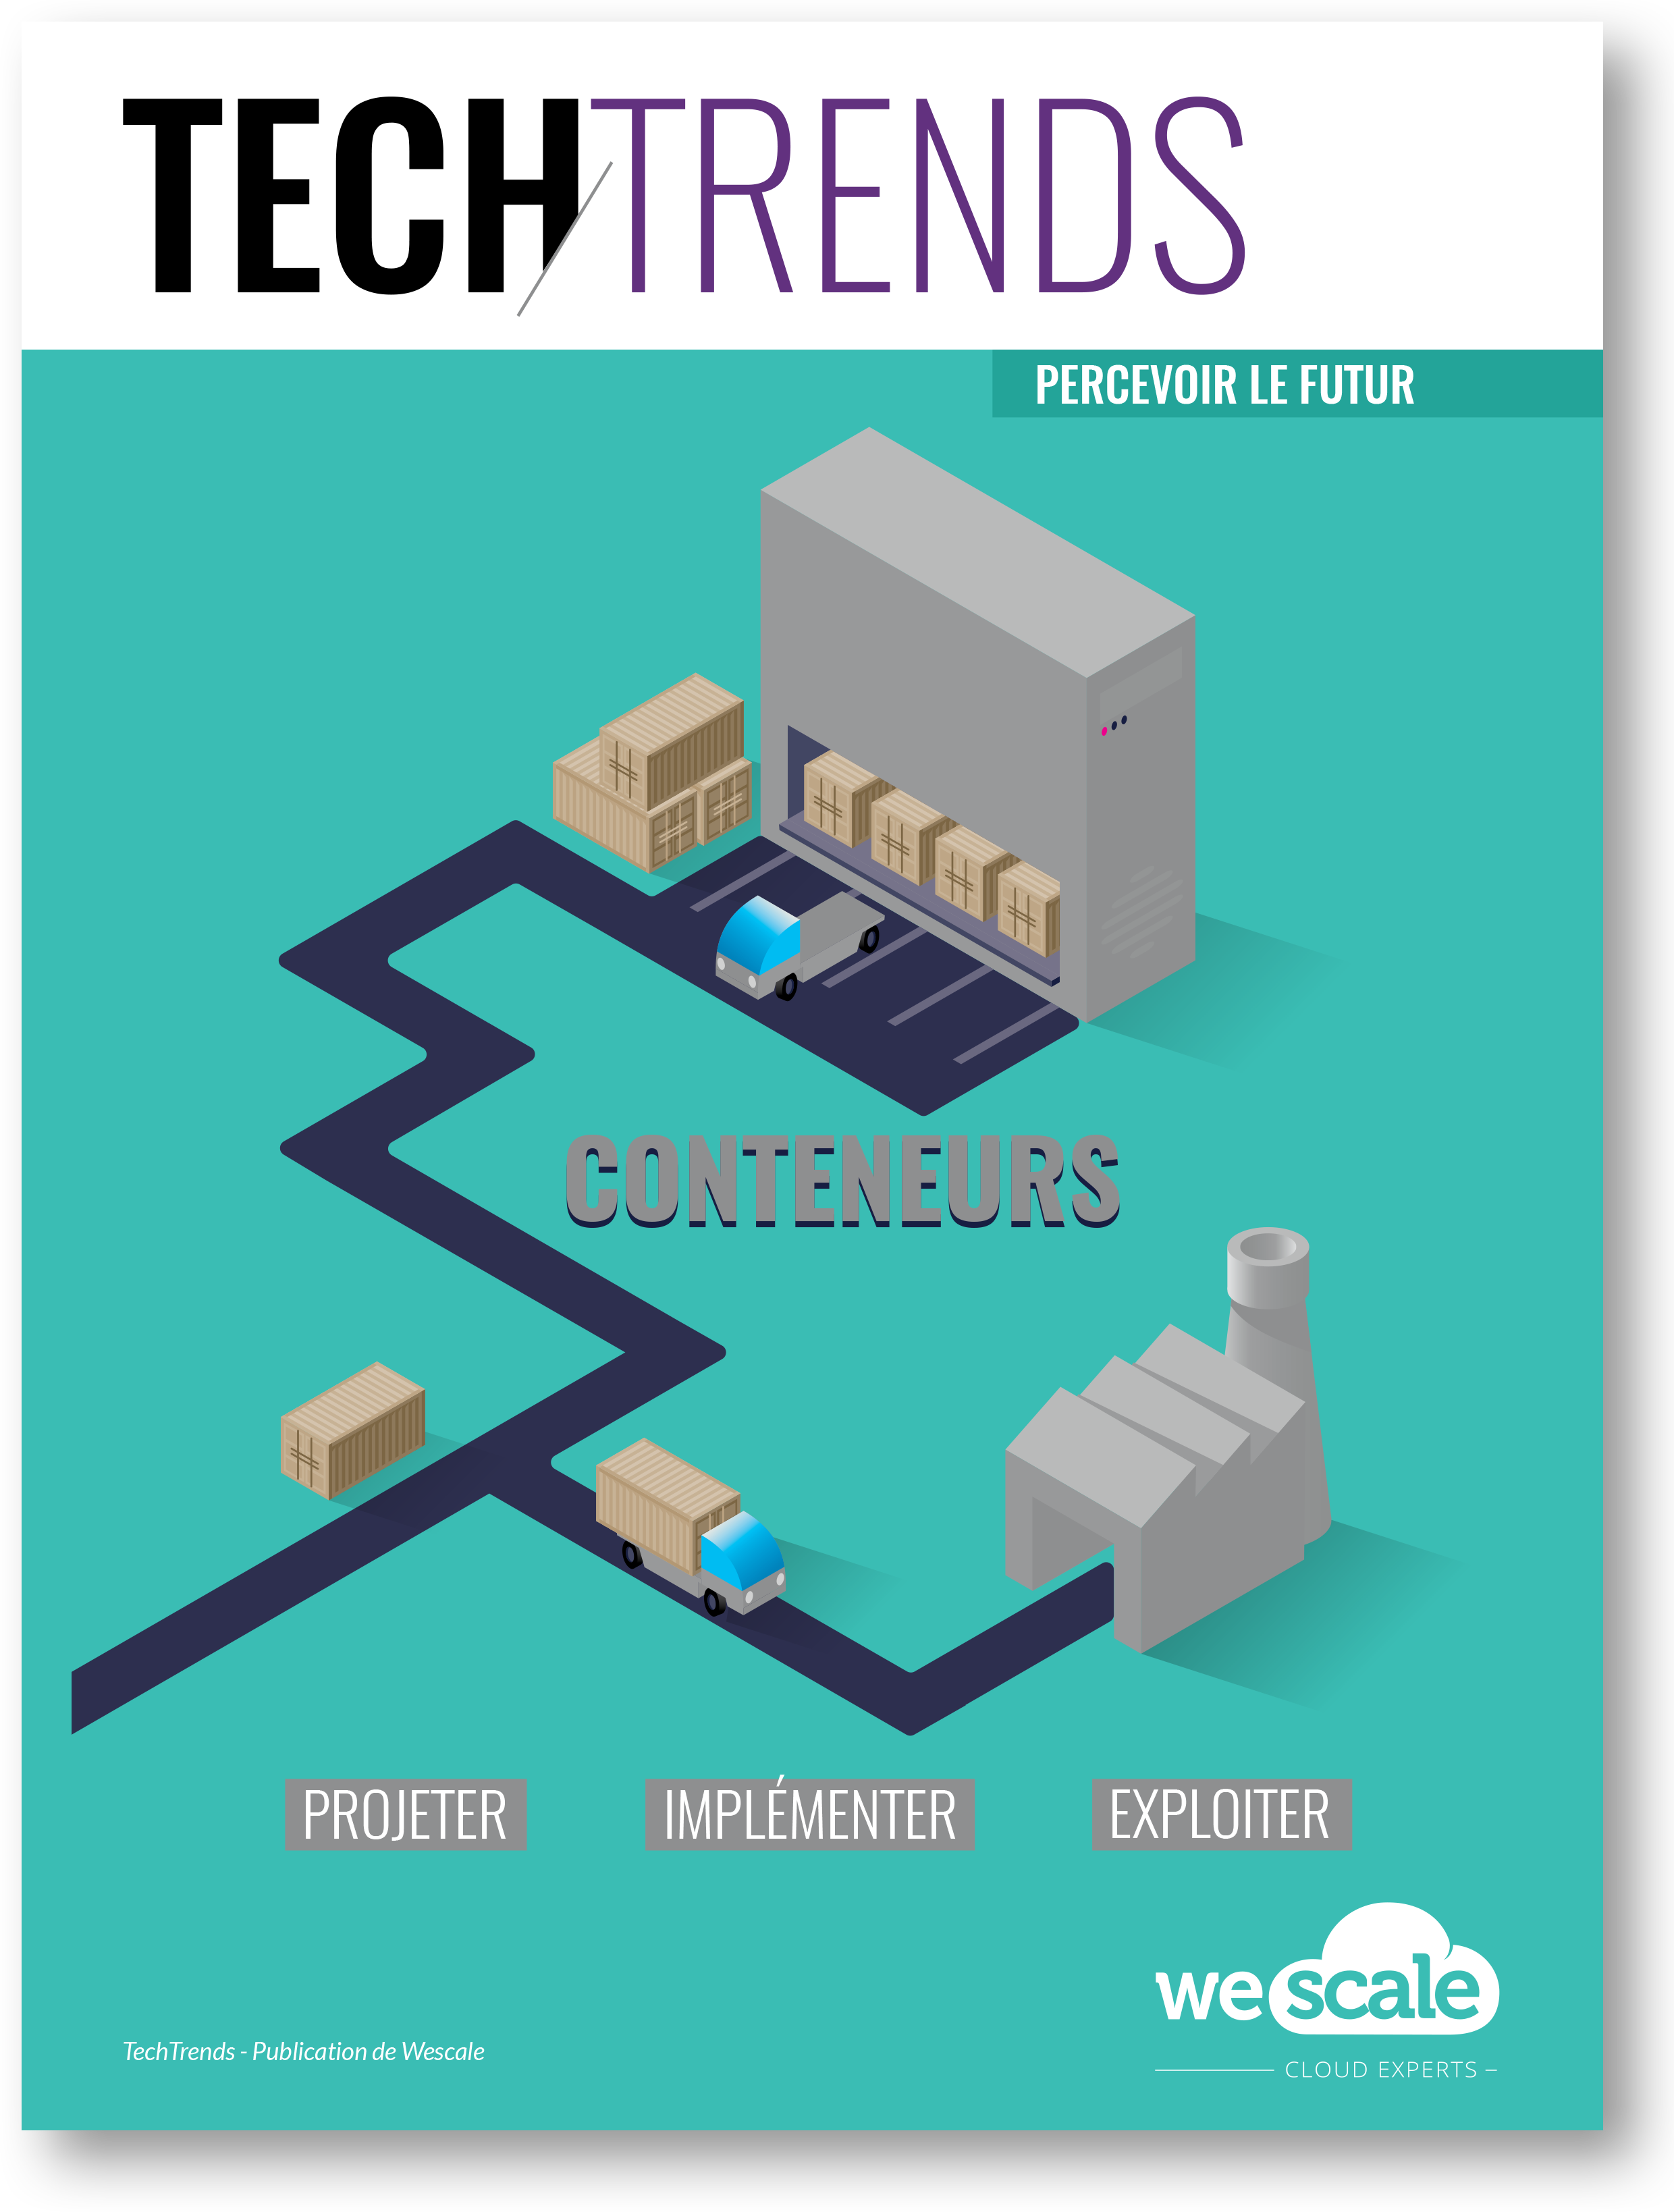 techtrends-cover-conteneurs.png